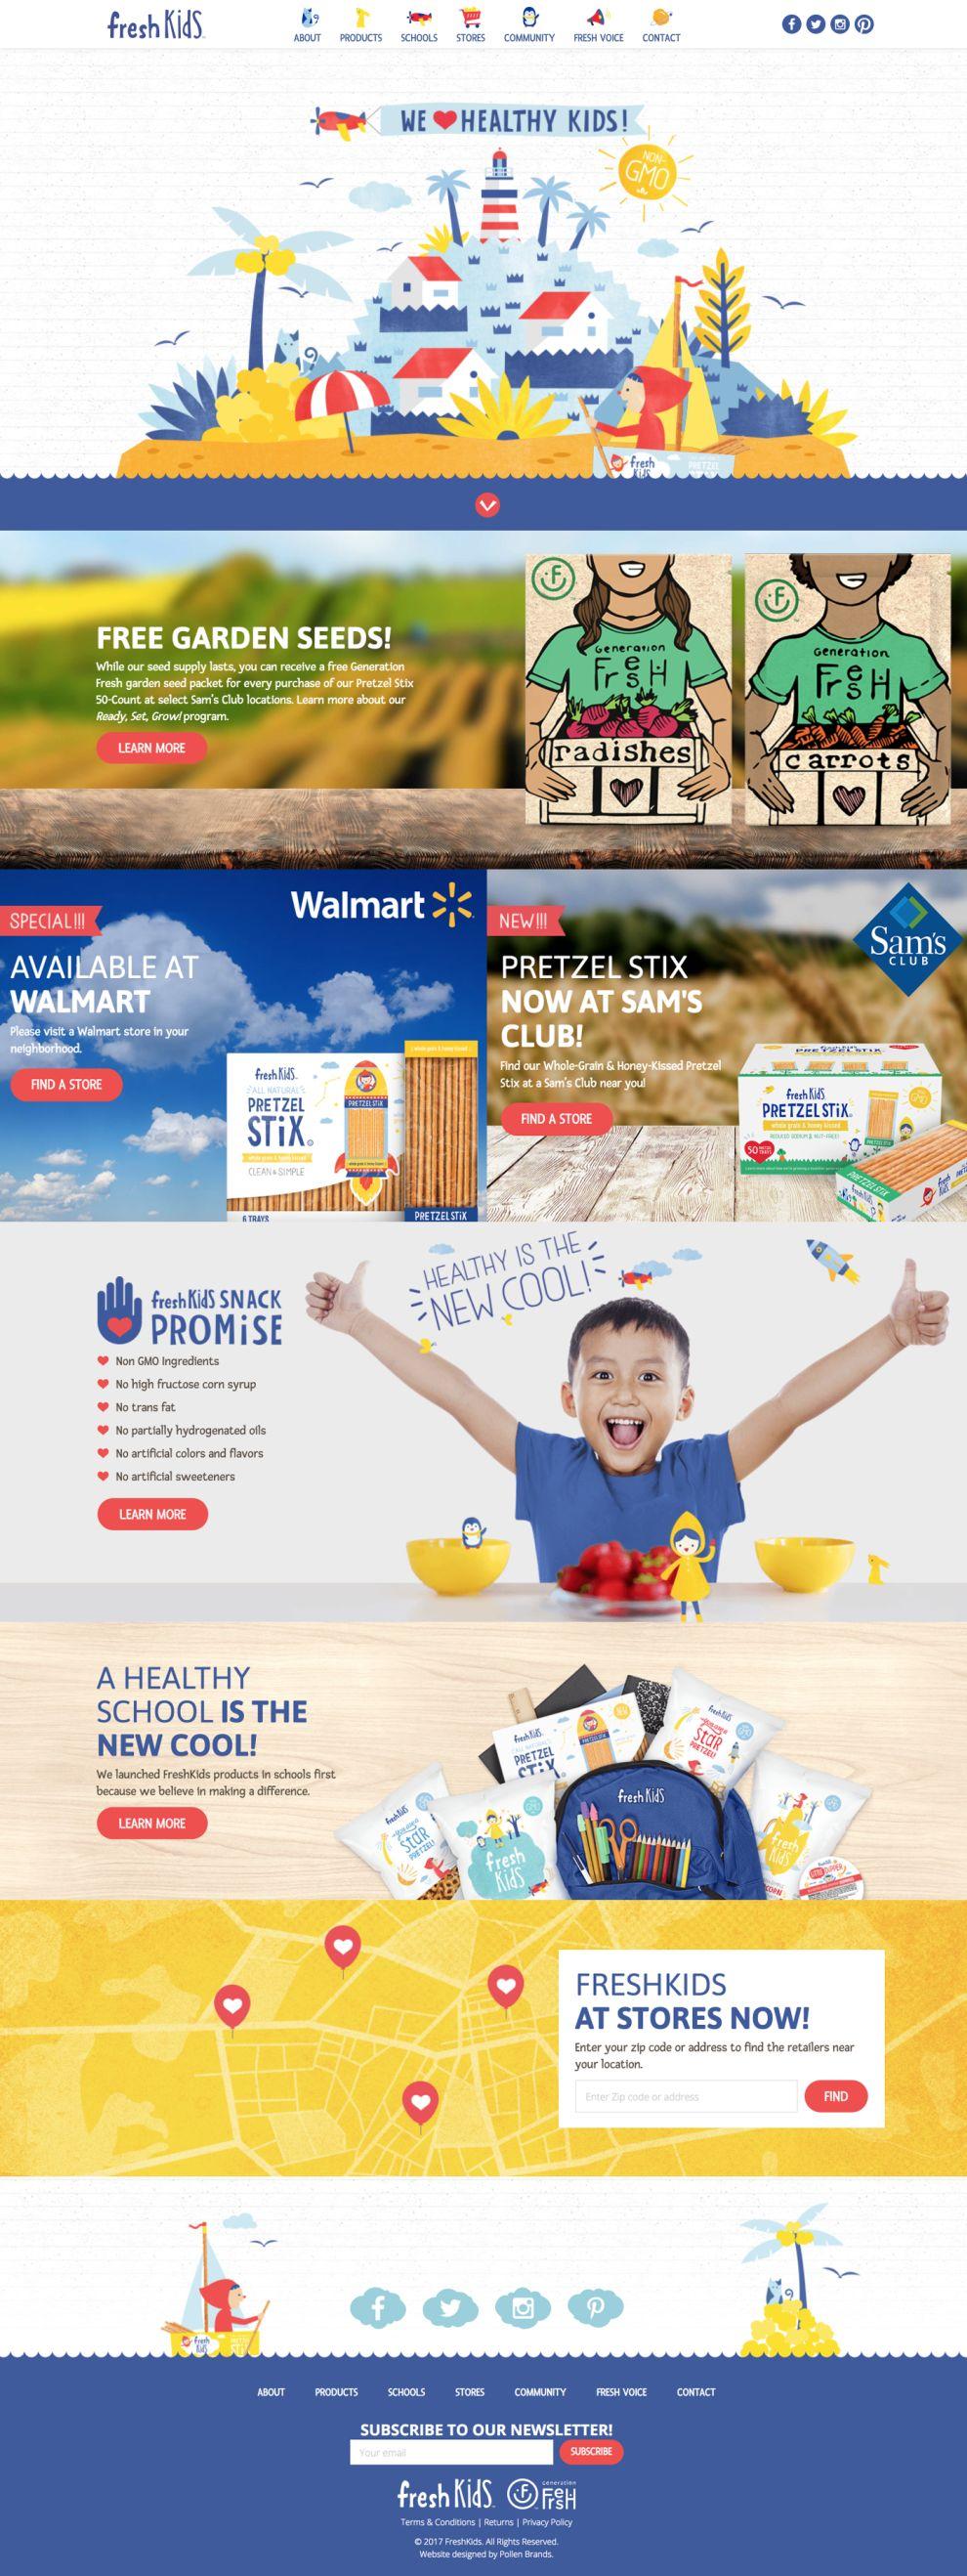 Fresh Kids Website Design Homepage